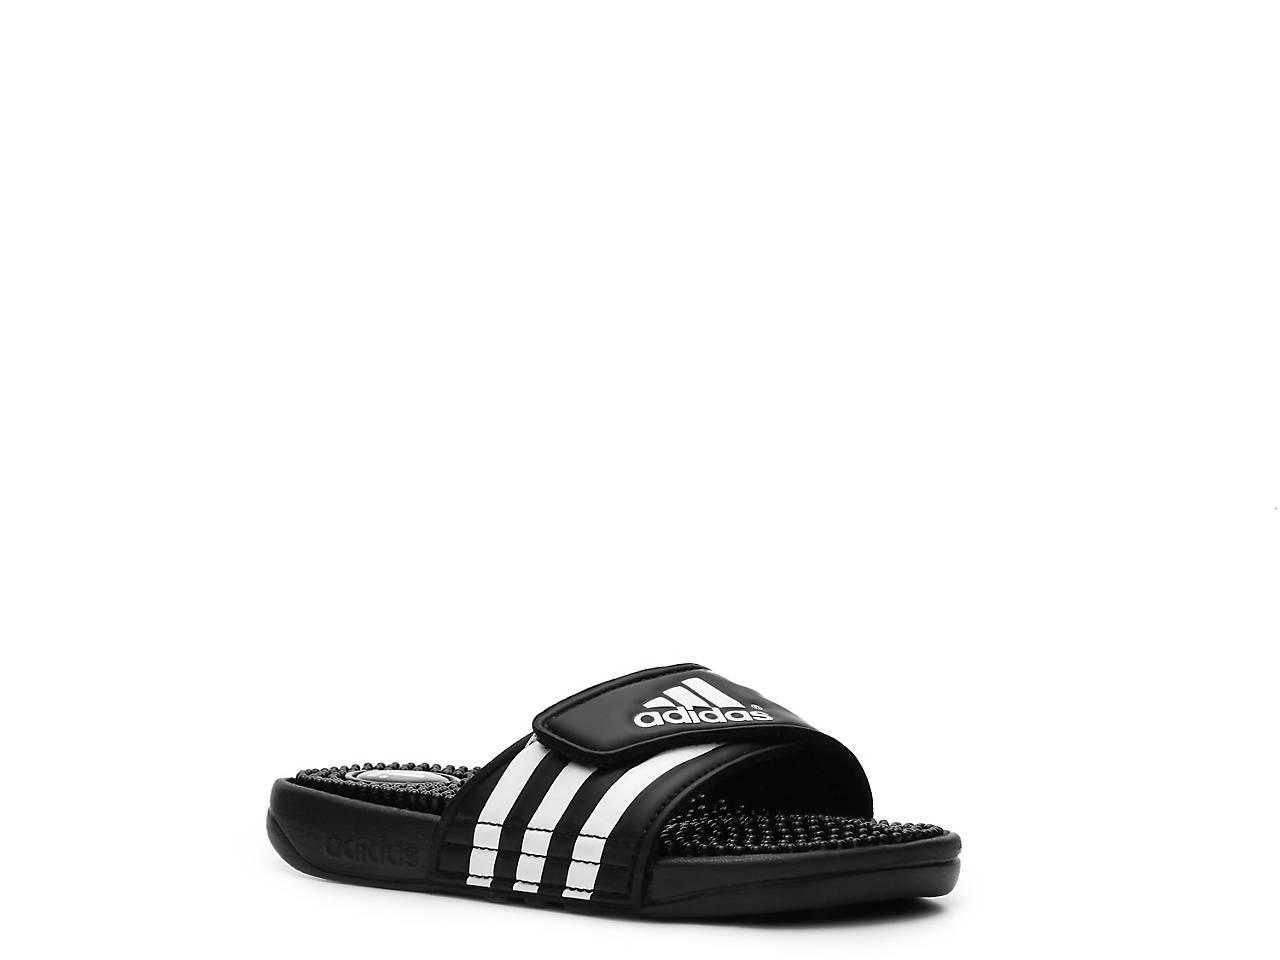 adidas Adissage Toddler   Youth Slide Sandal Kids Shoes  26d711d89061